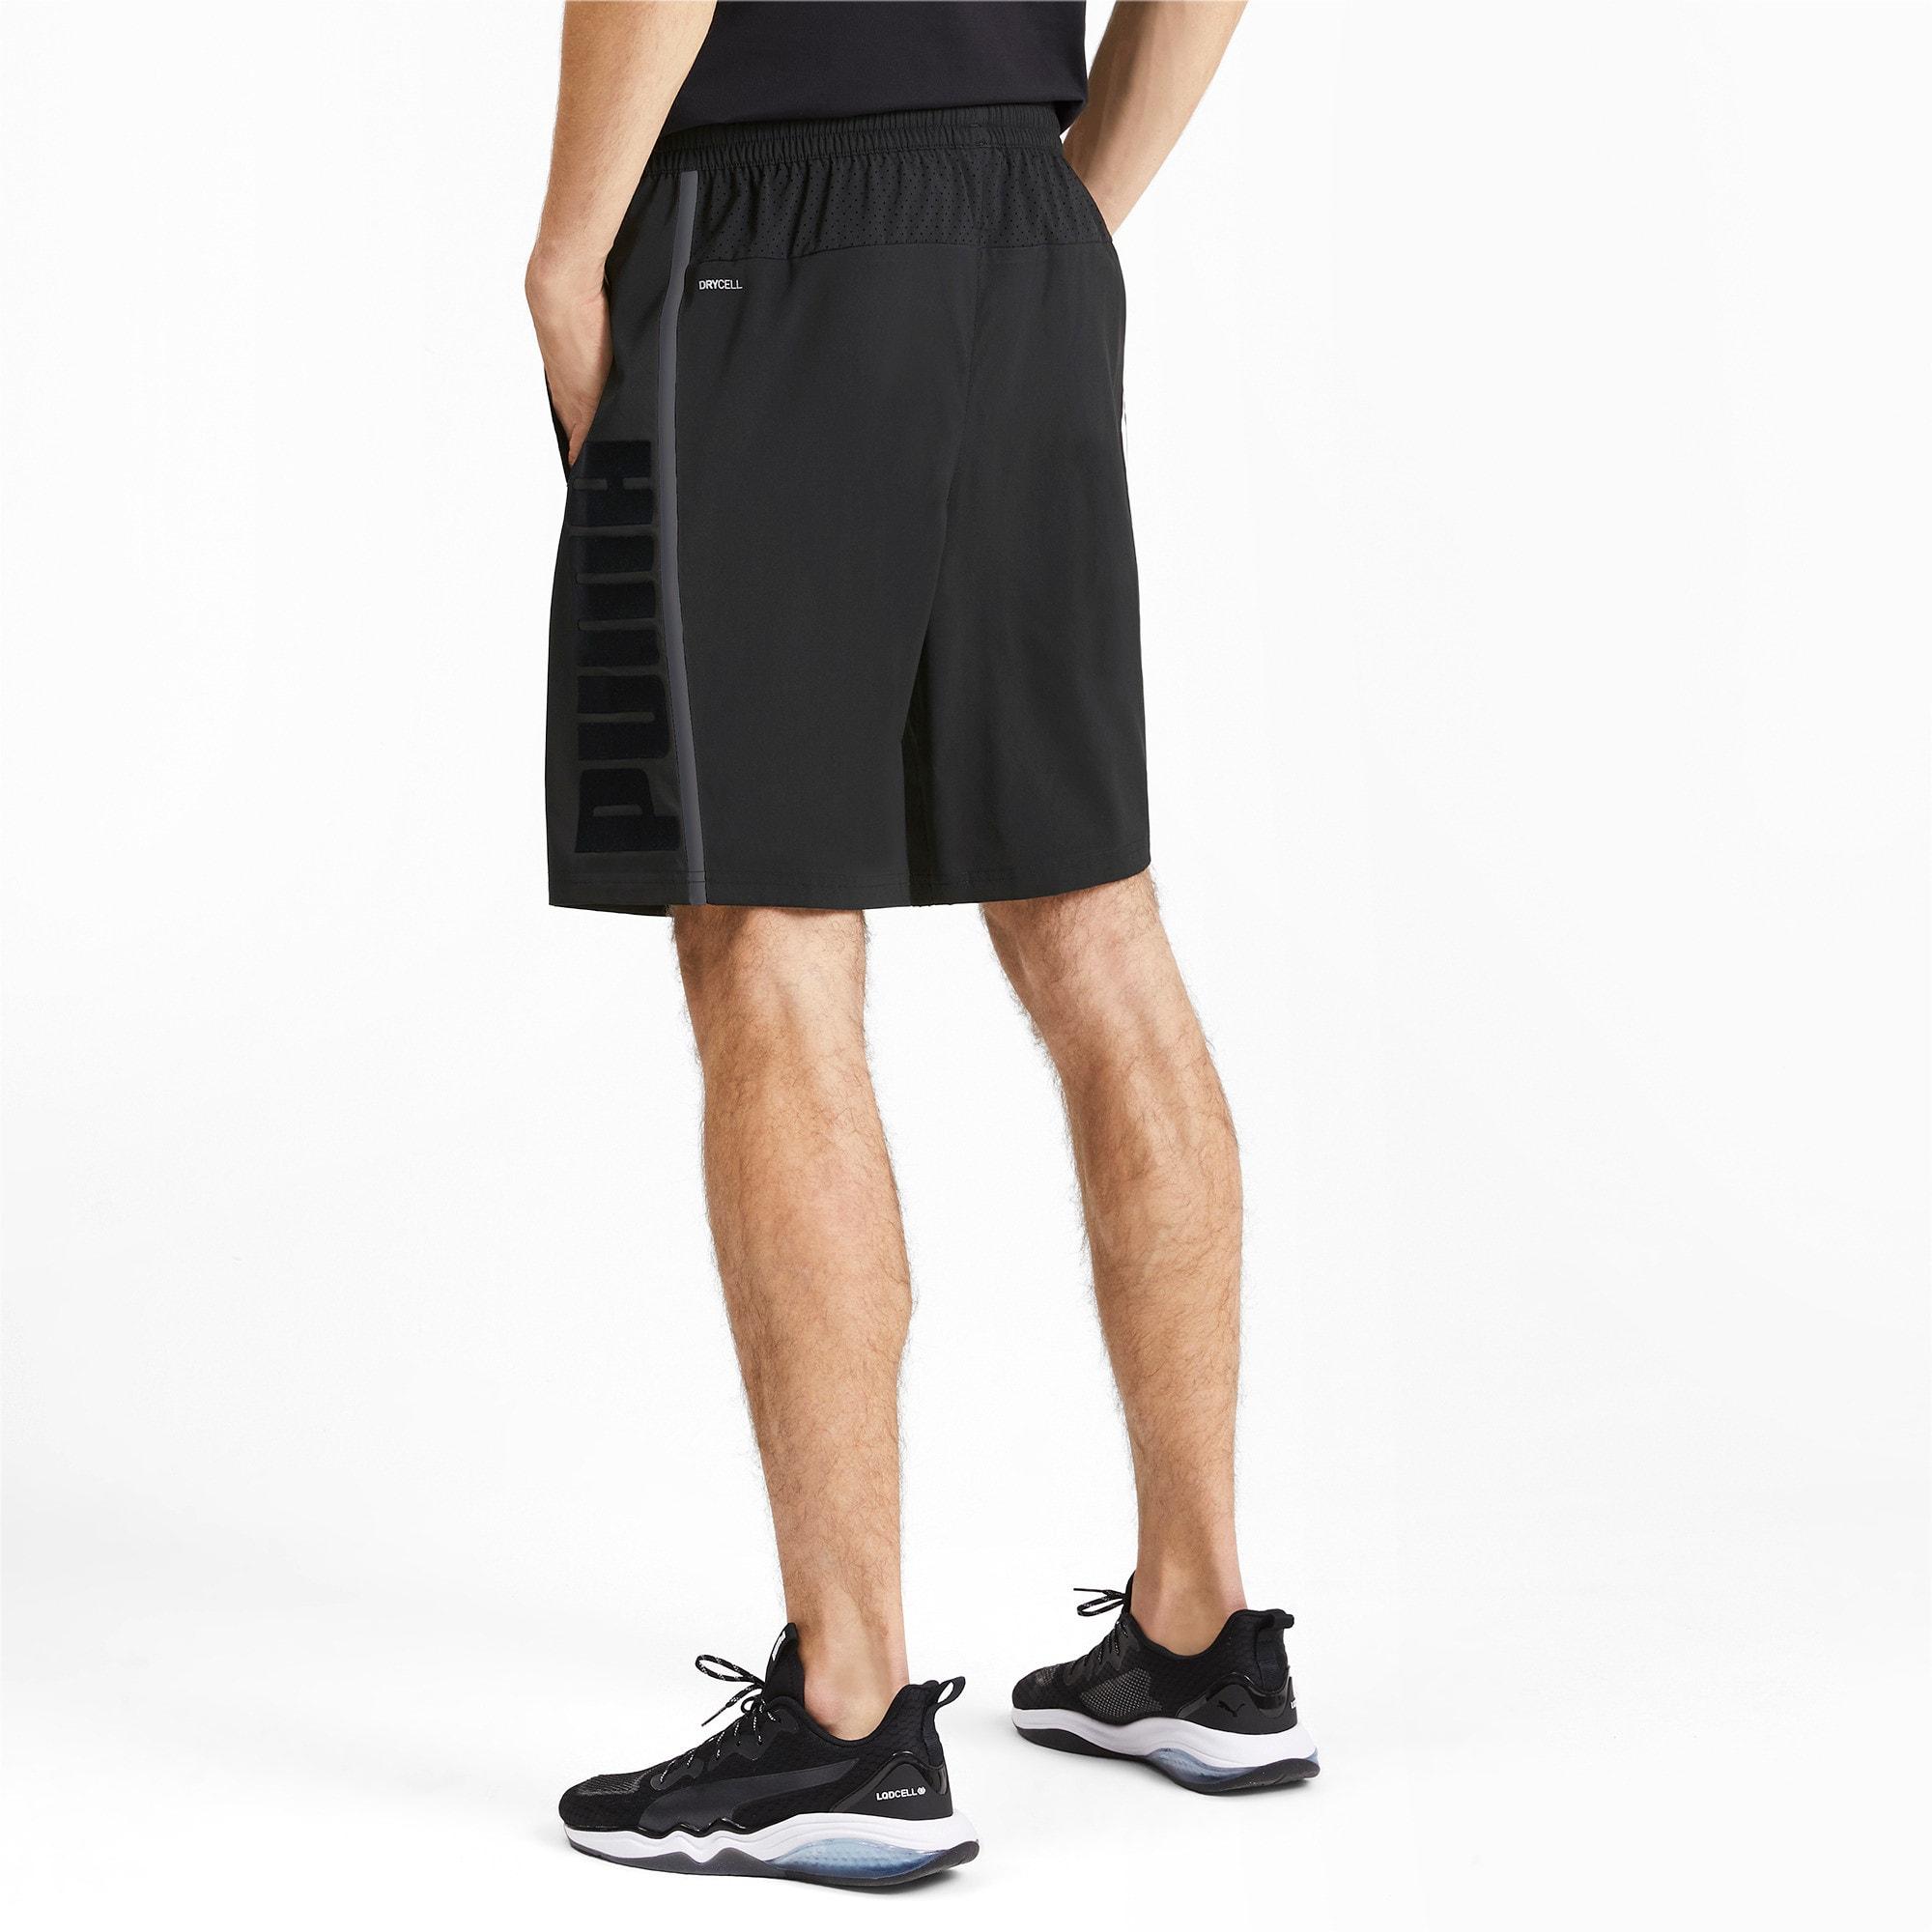 Thumbnail 2 of Power BND Men's Shorts, Puma Black, medium